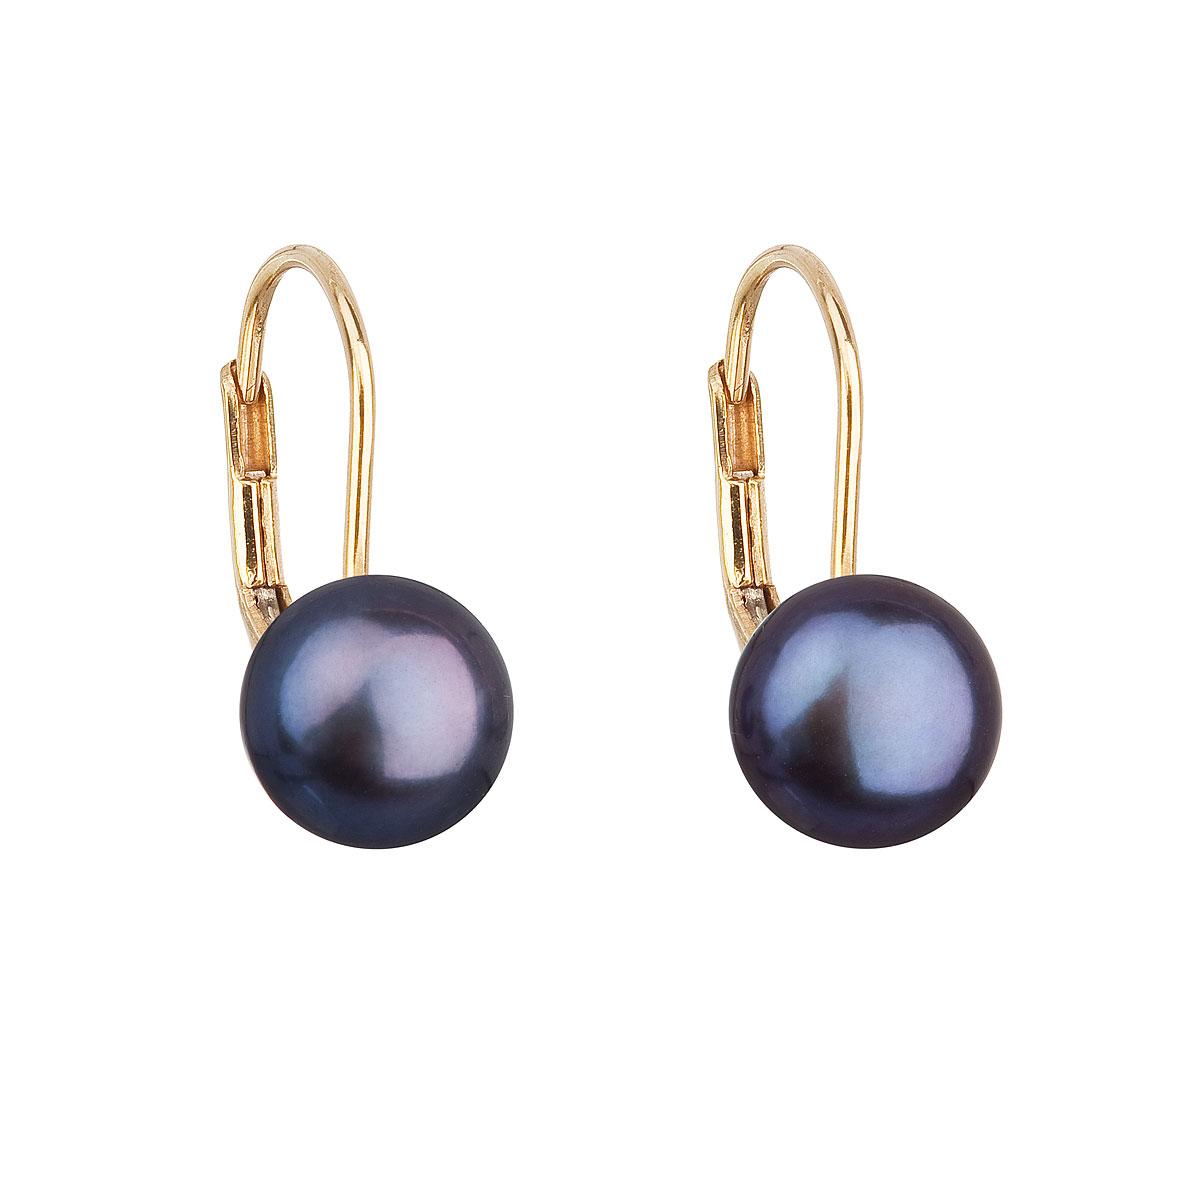 Zlaté 14 karátové náušnice visacie s modrou riečnou perlou 921009.3